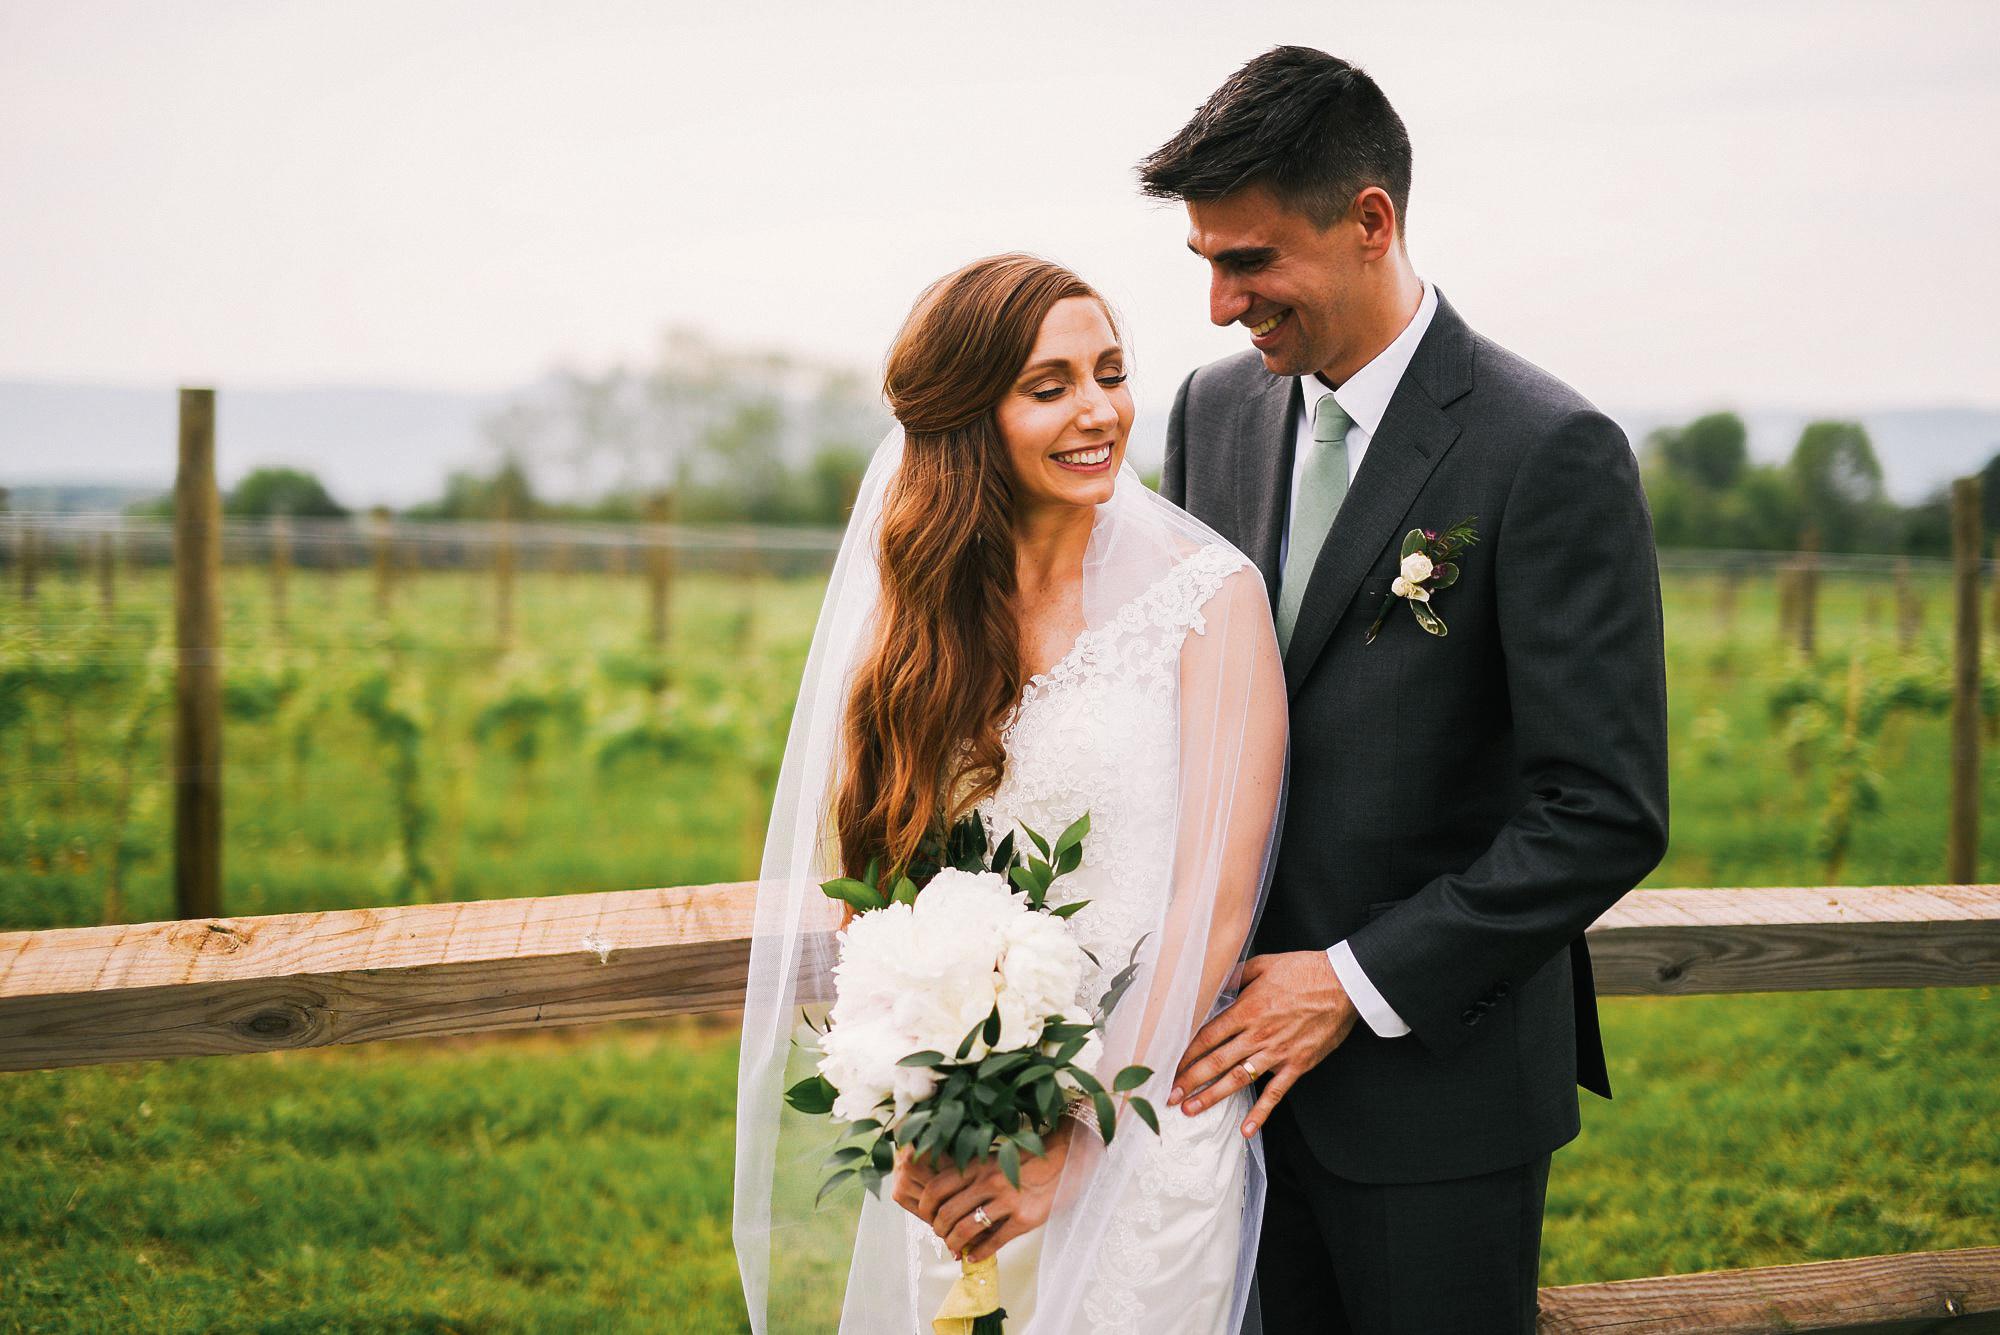 wedding-photography-virginia_0028.jpg